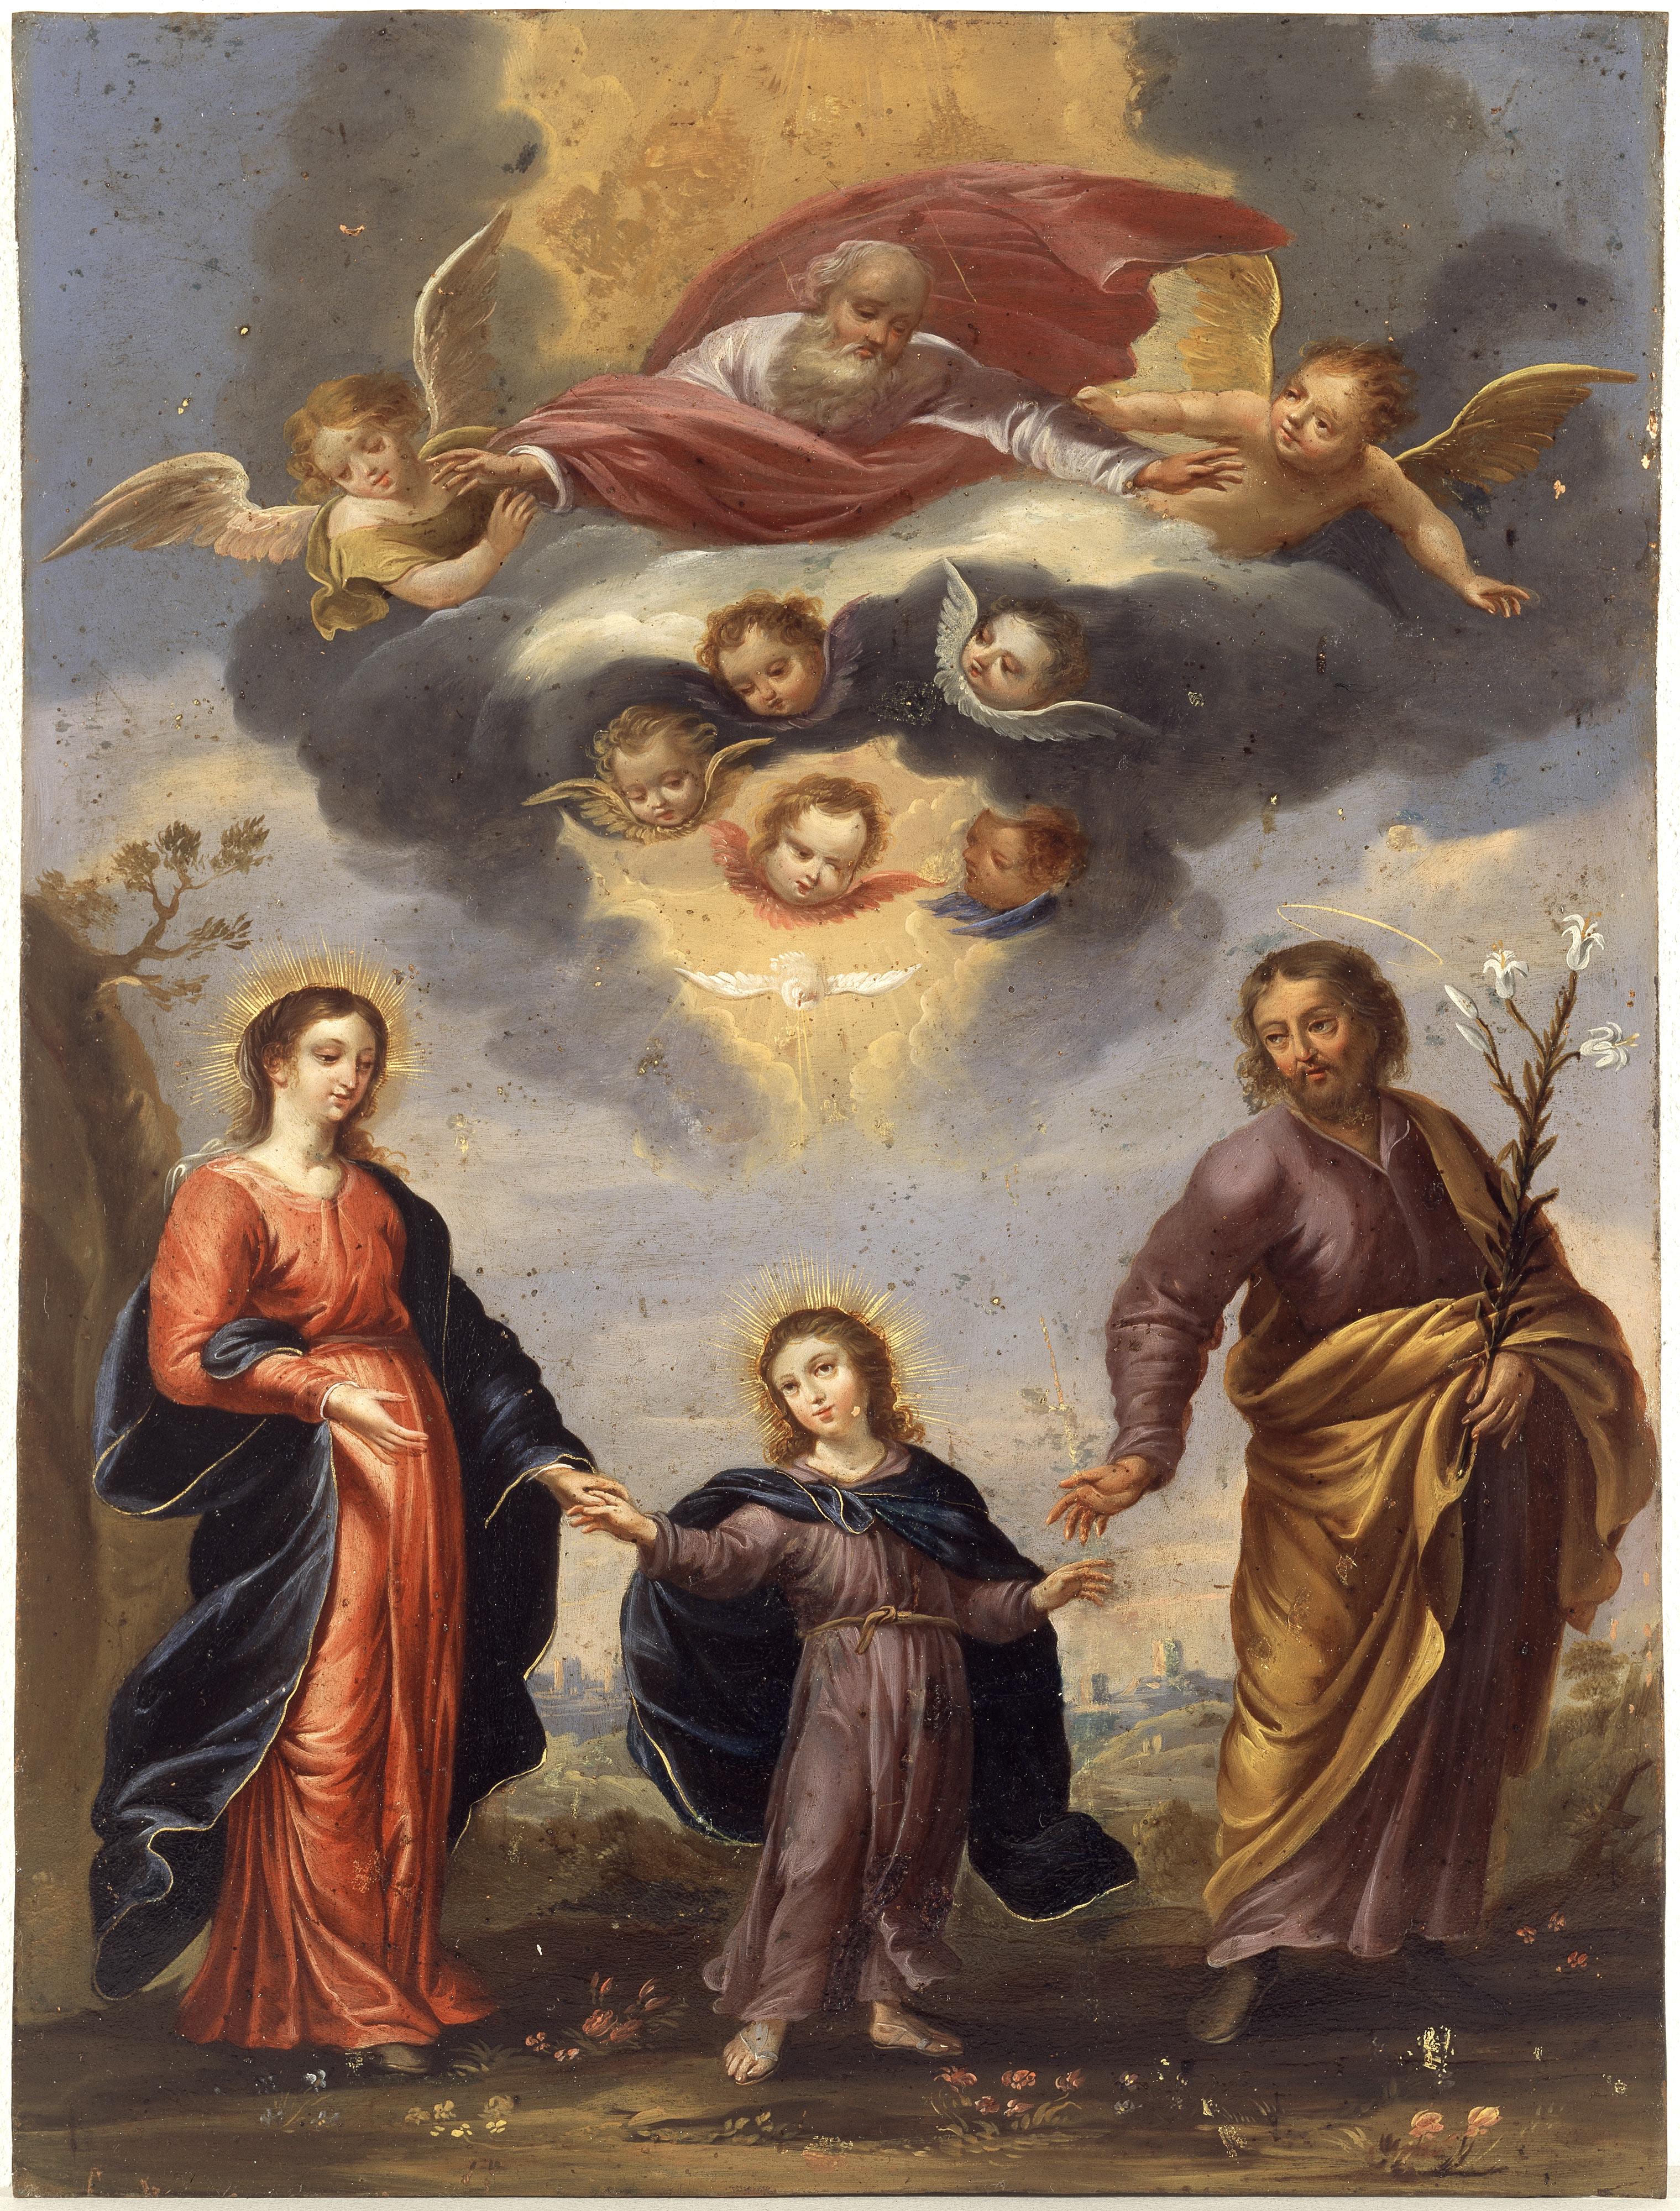 Escuela De Rubens Sagrada Familia Artfecit Pintura Y Dibujo